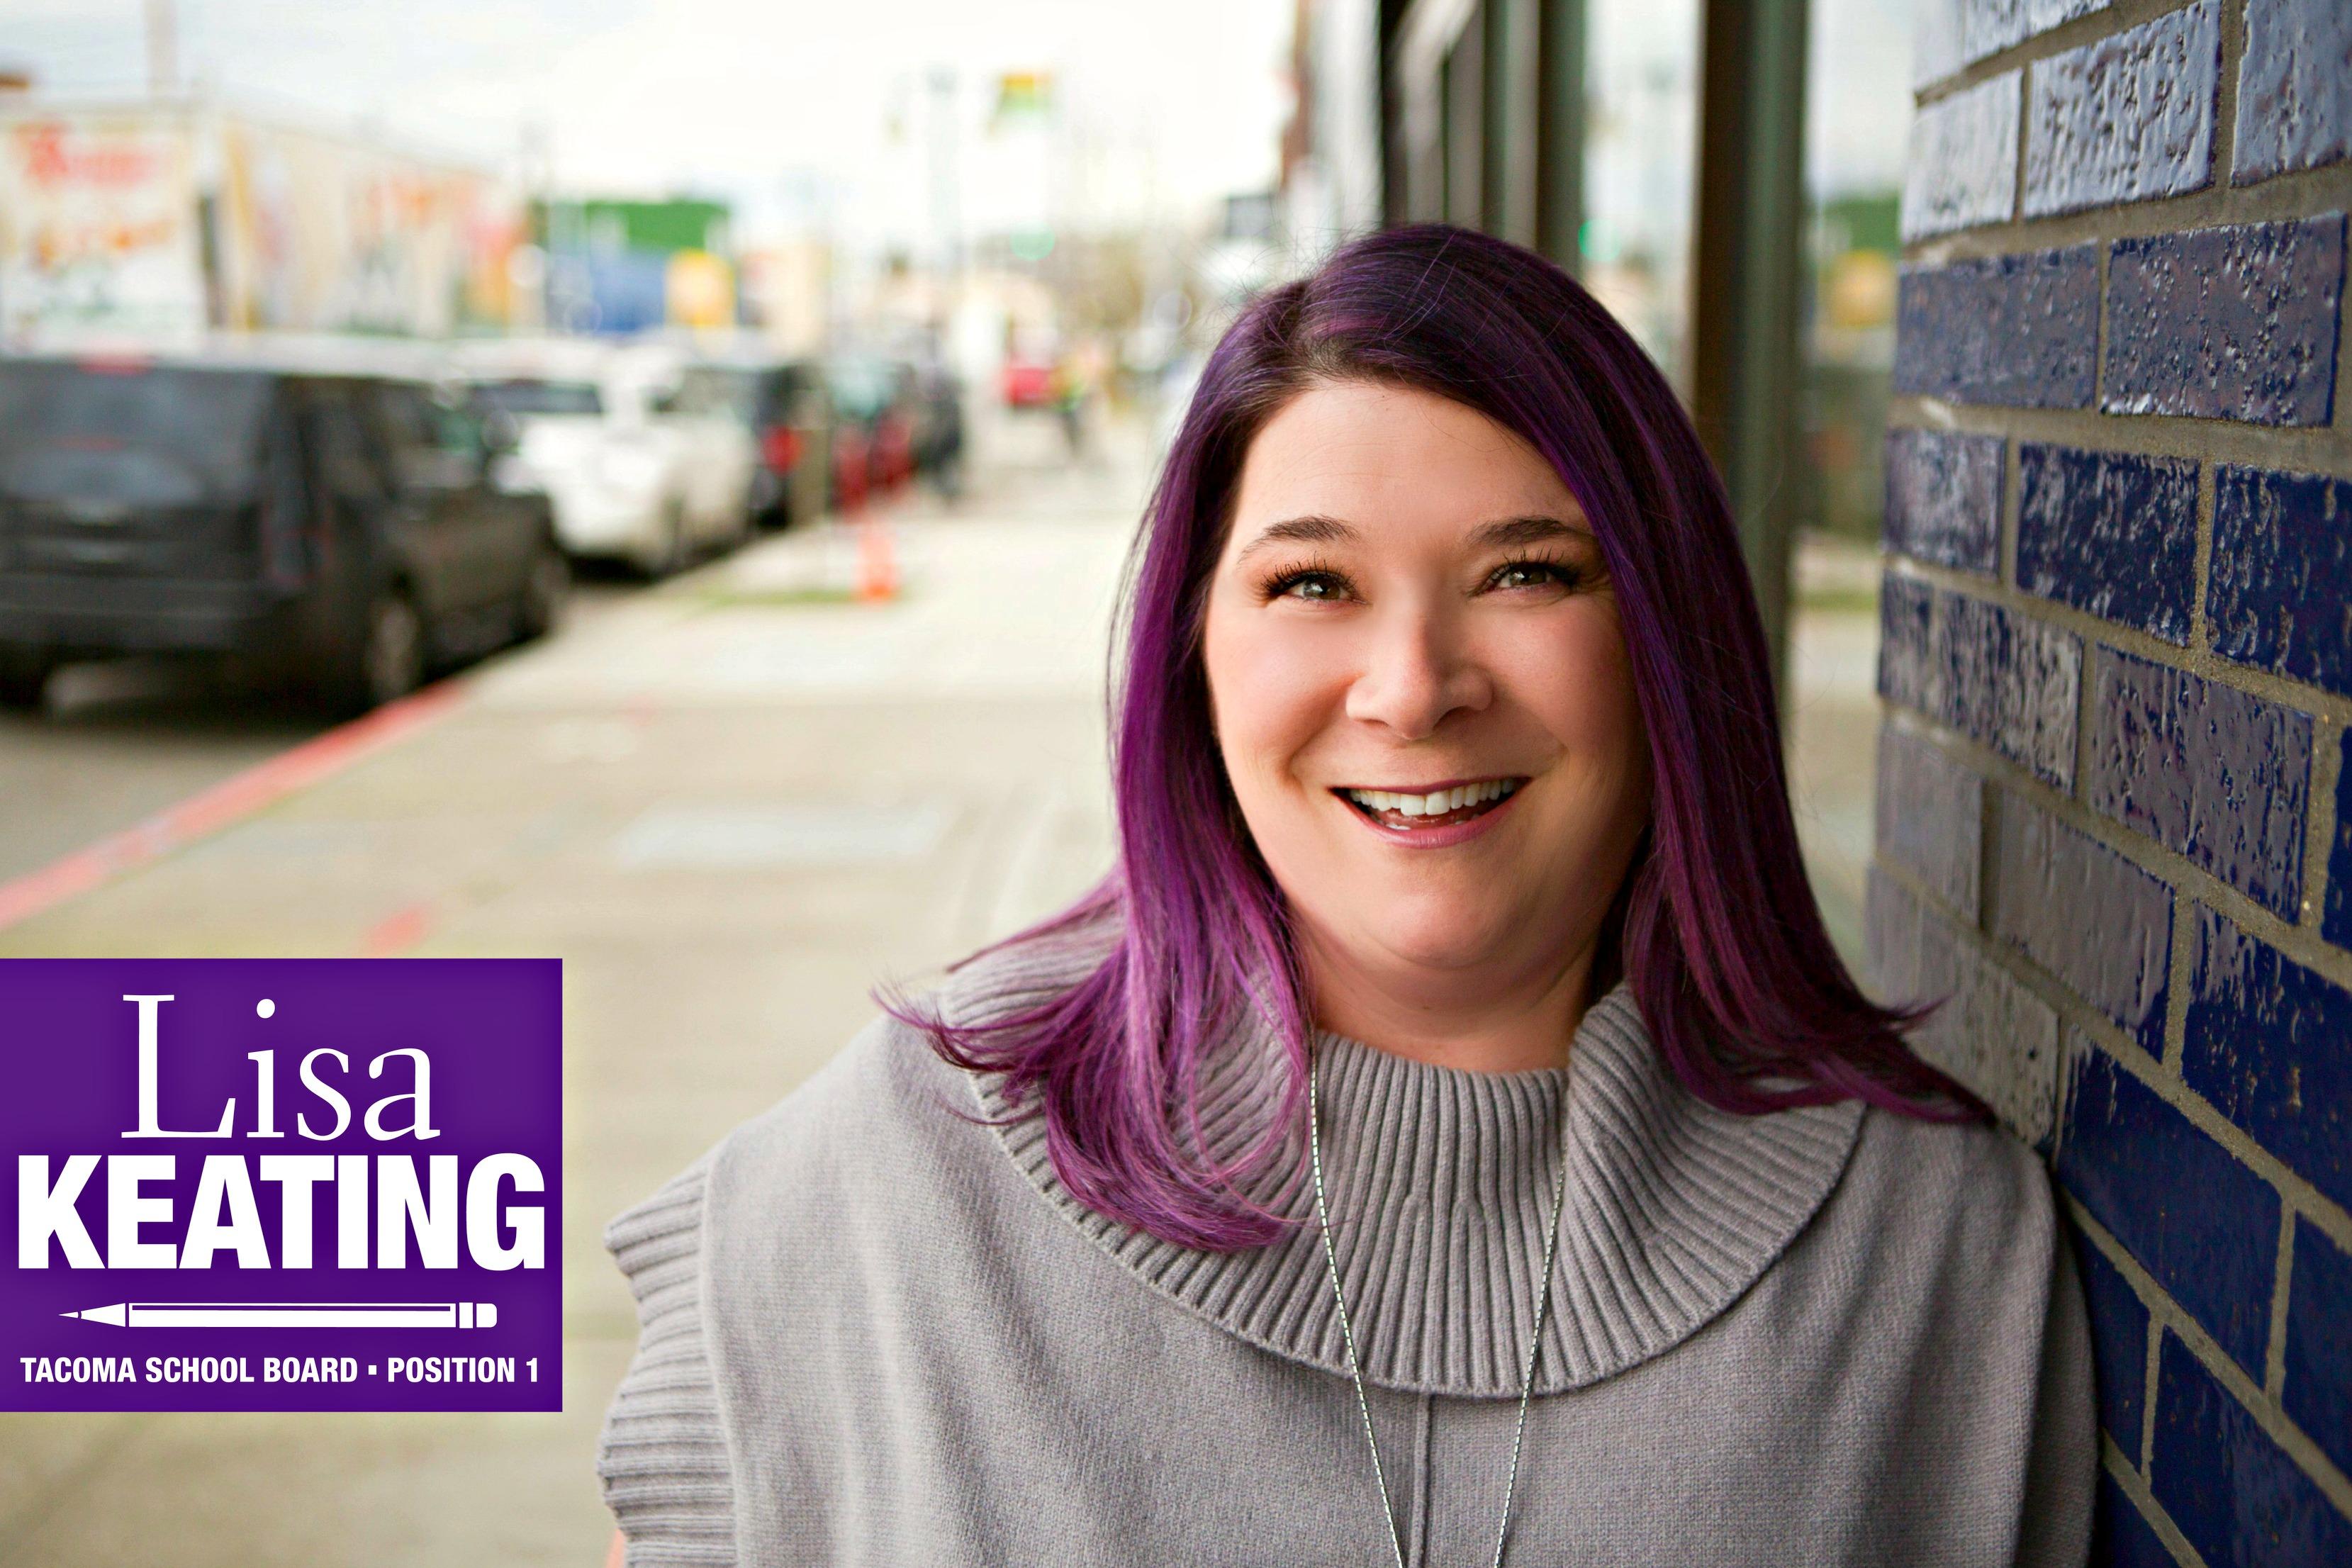 Friends for Lisa Keating